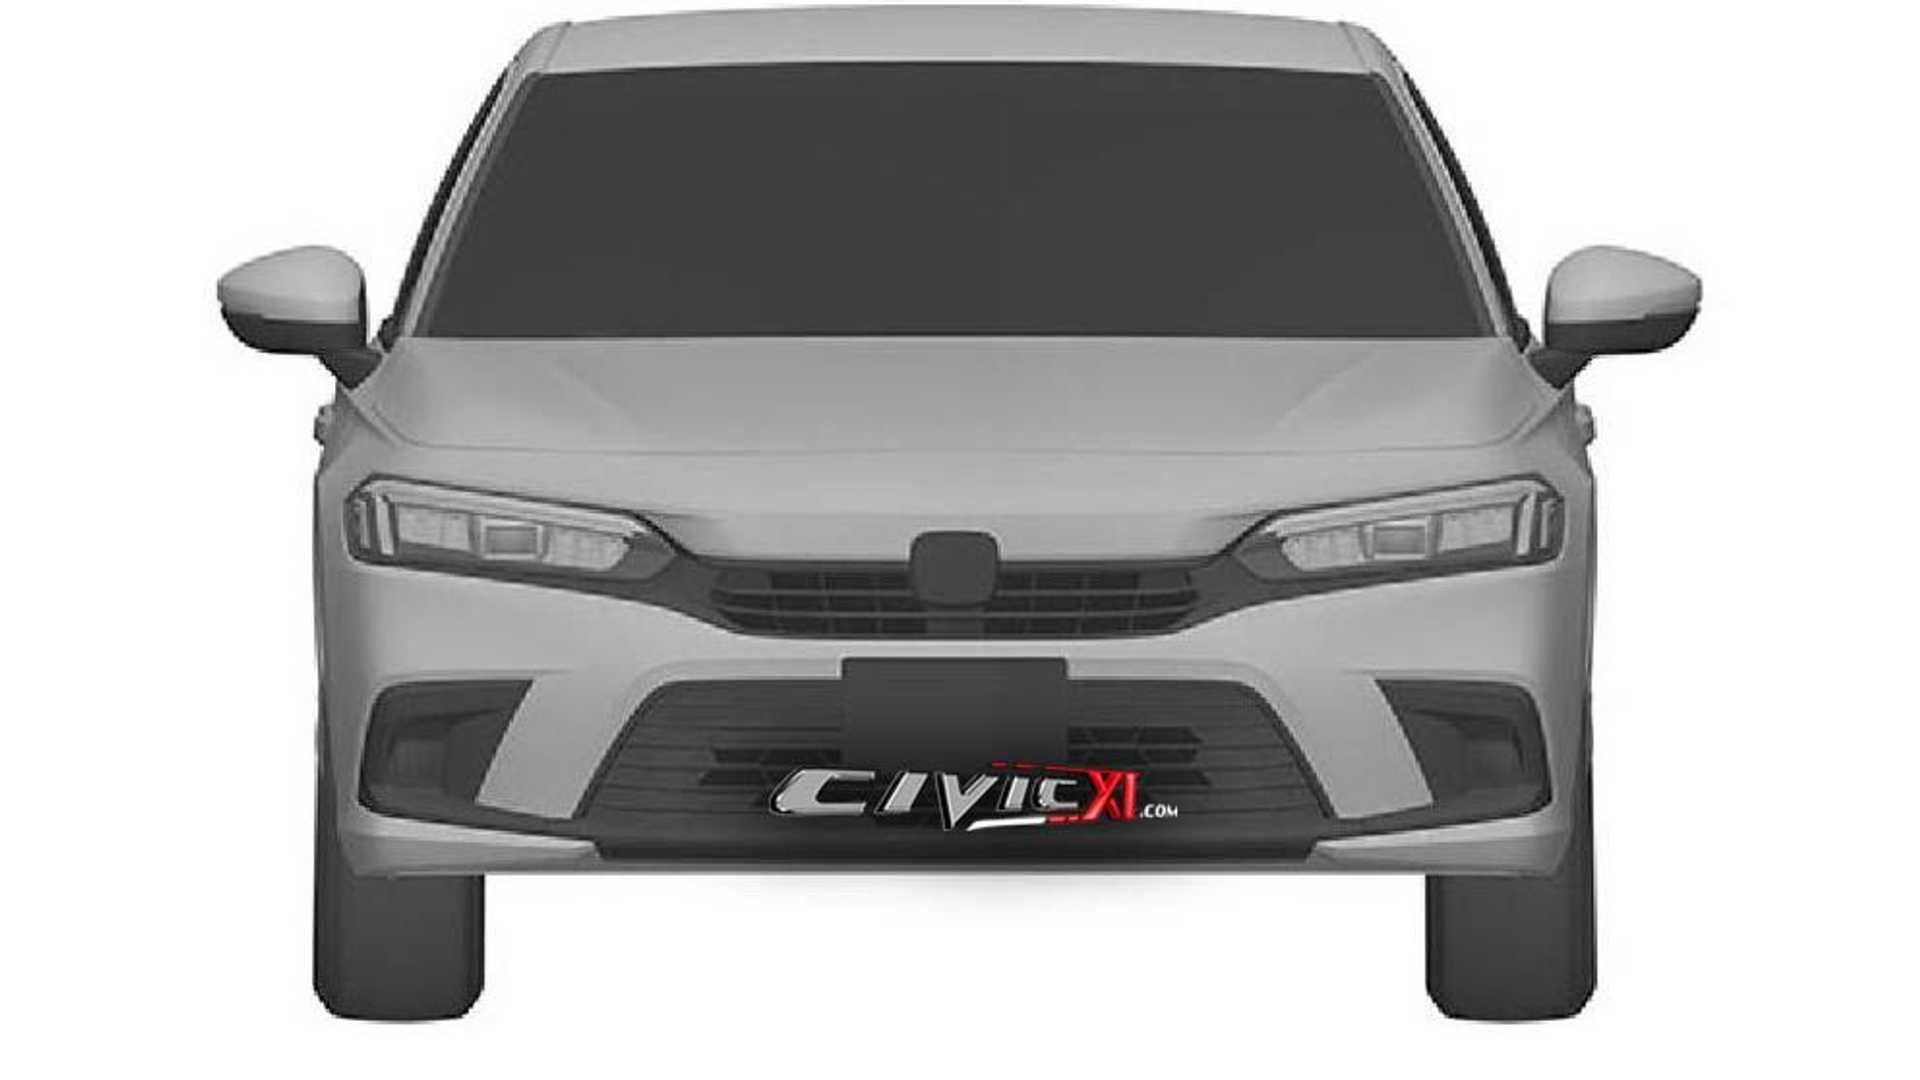 honda-civic-11th-generation-design-trademark-front